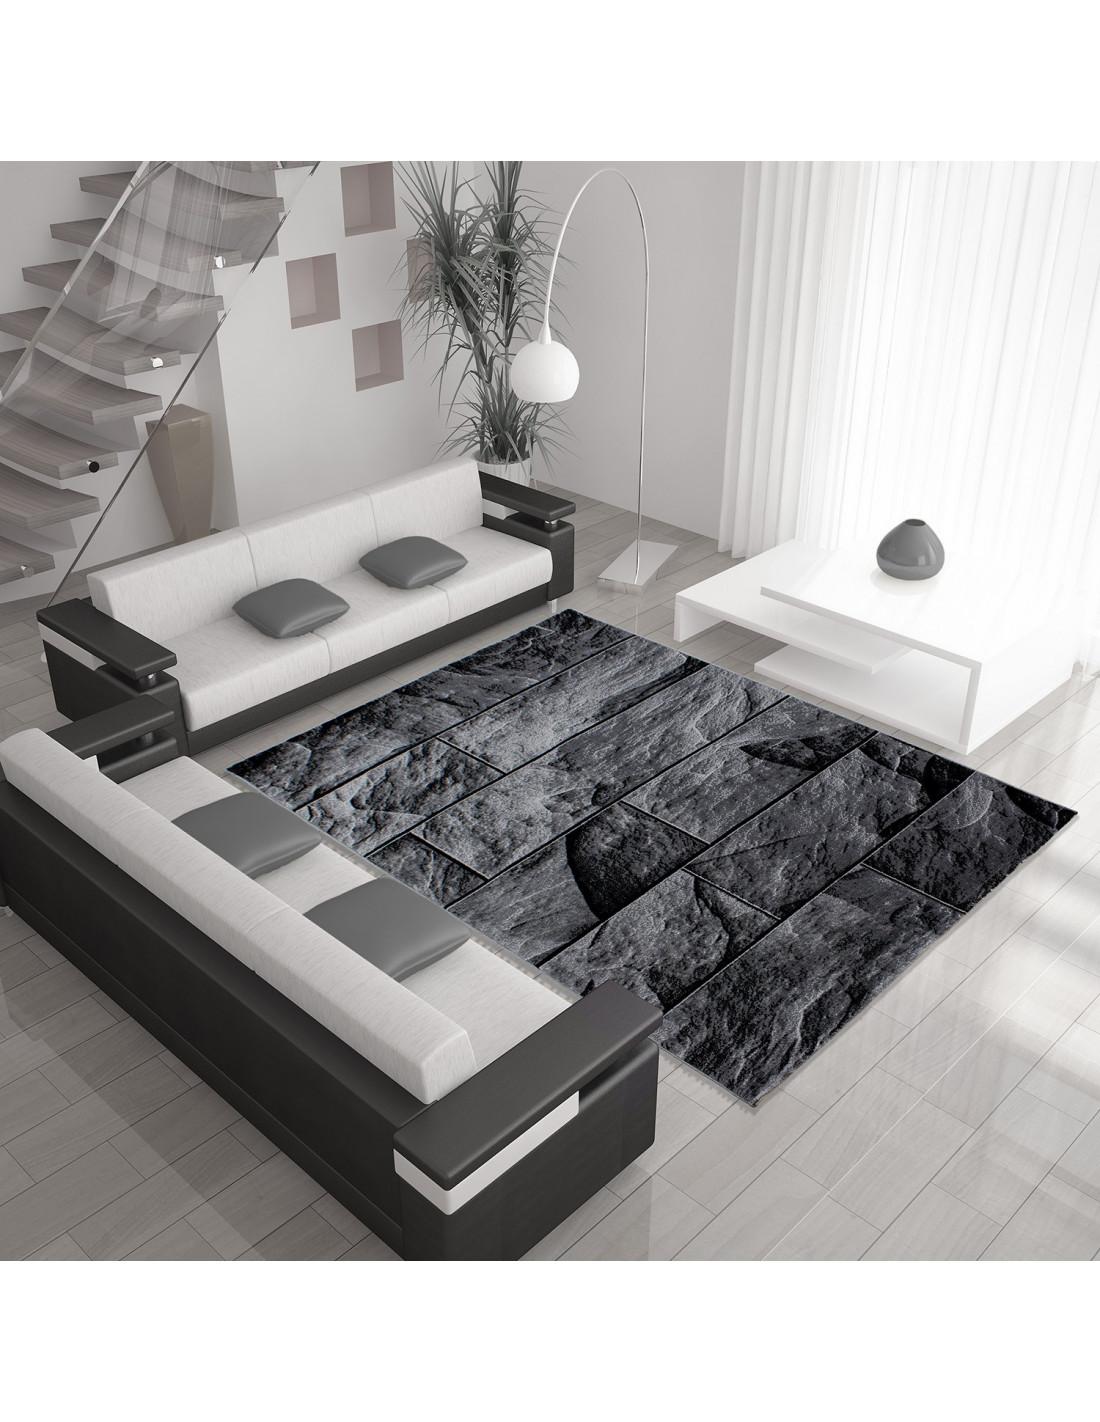 Modern designer living room rug with stone motif PARMA 9250 black-gray